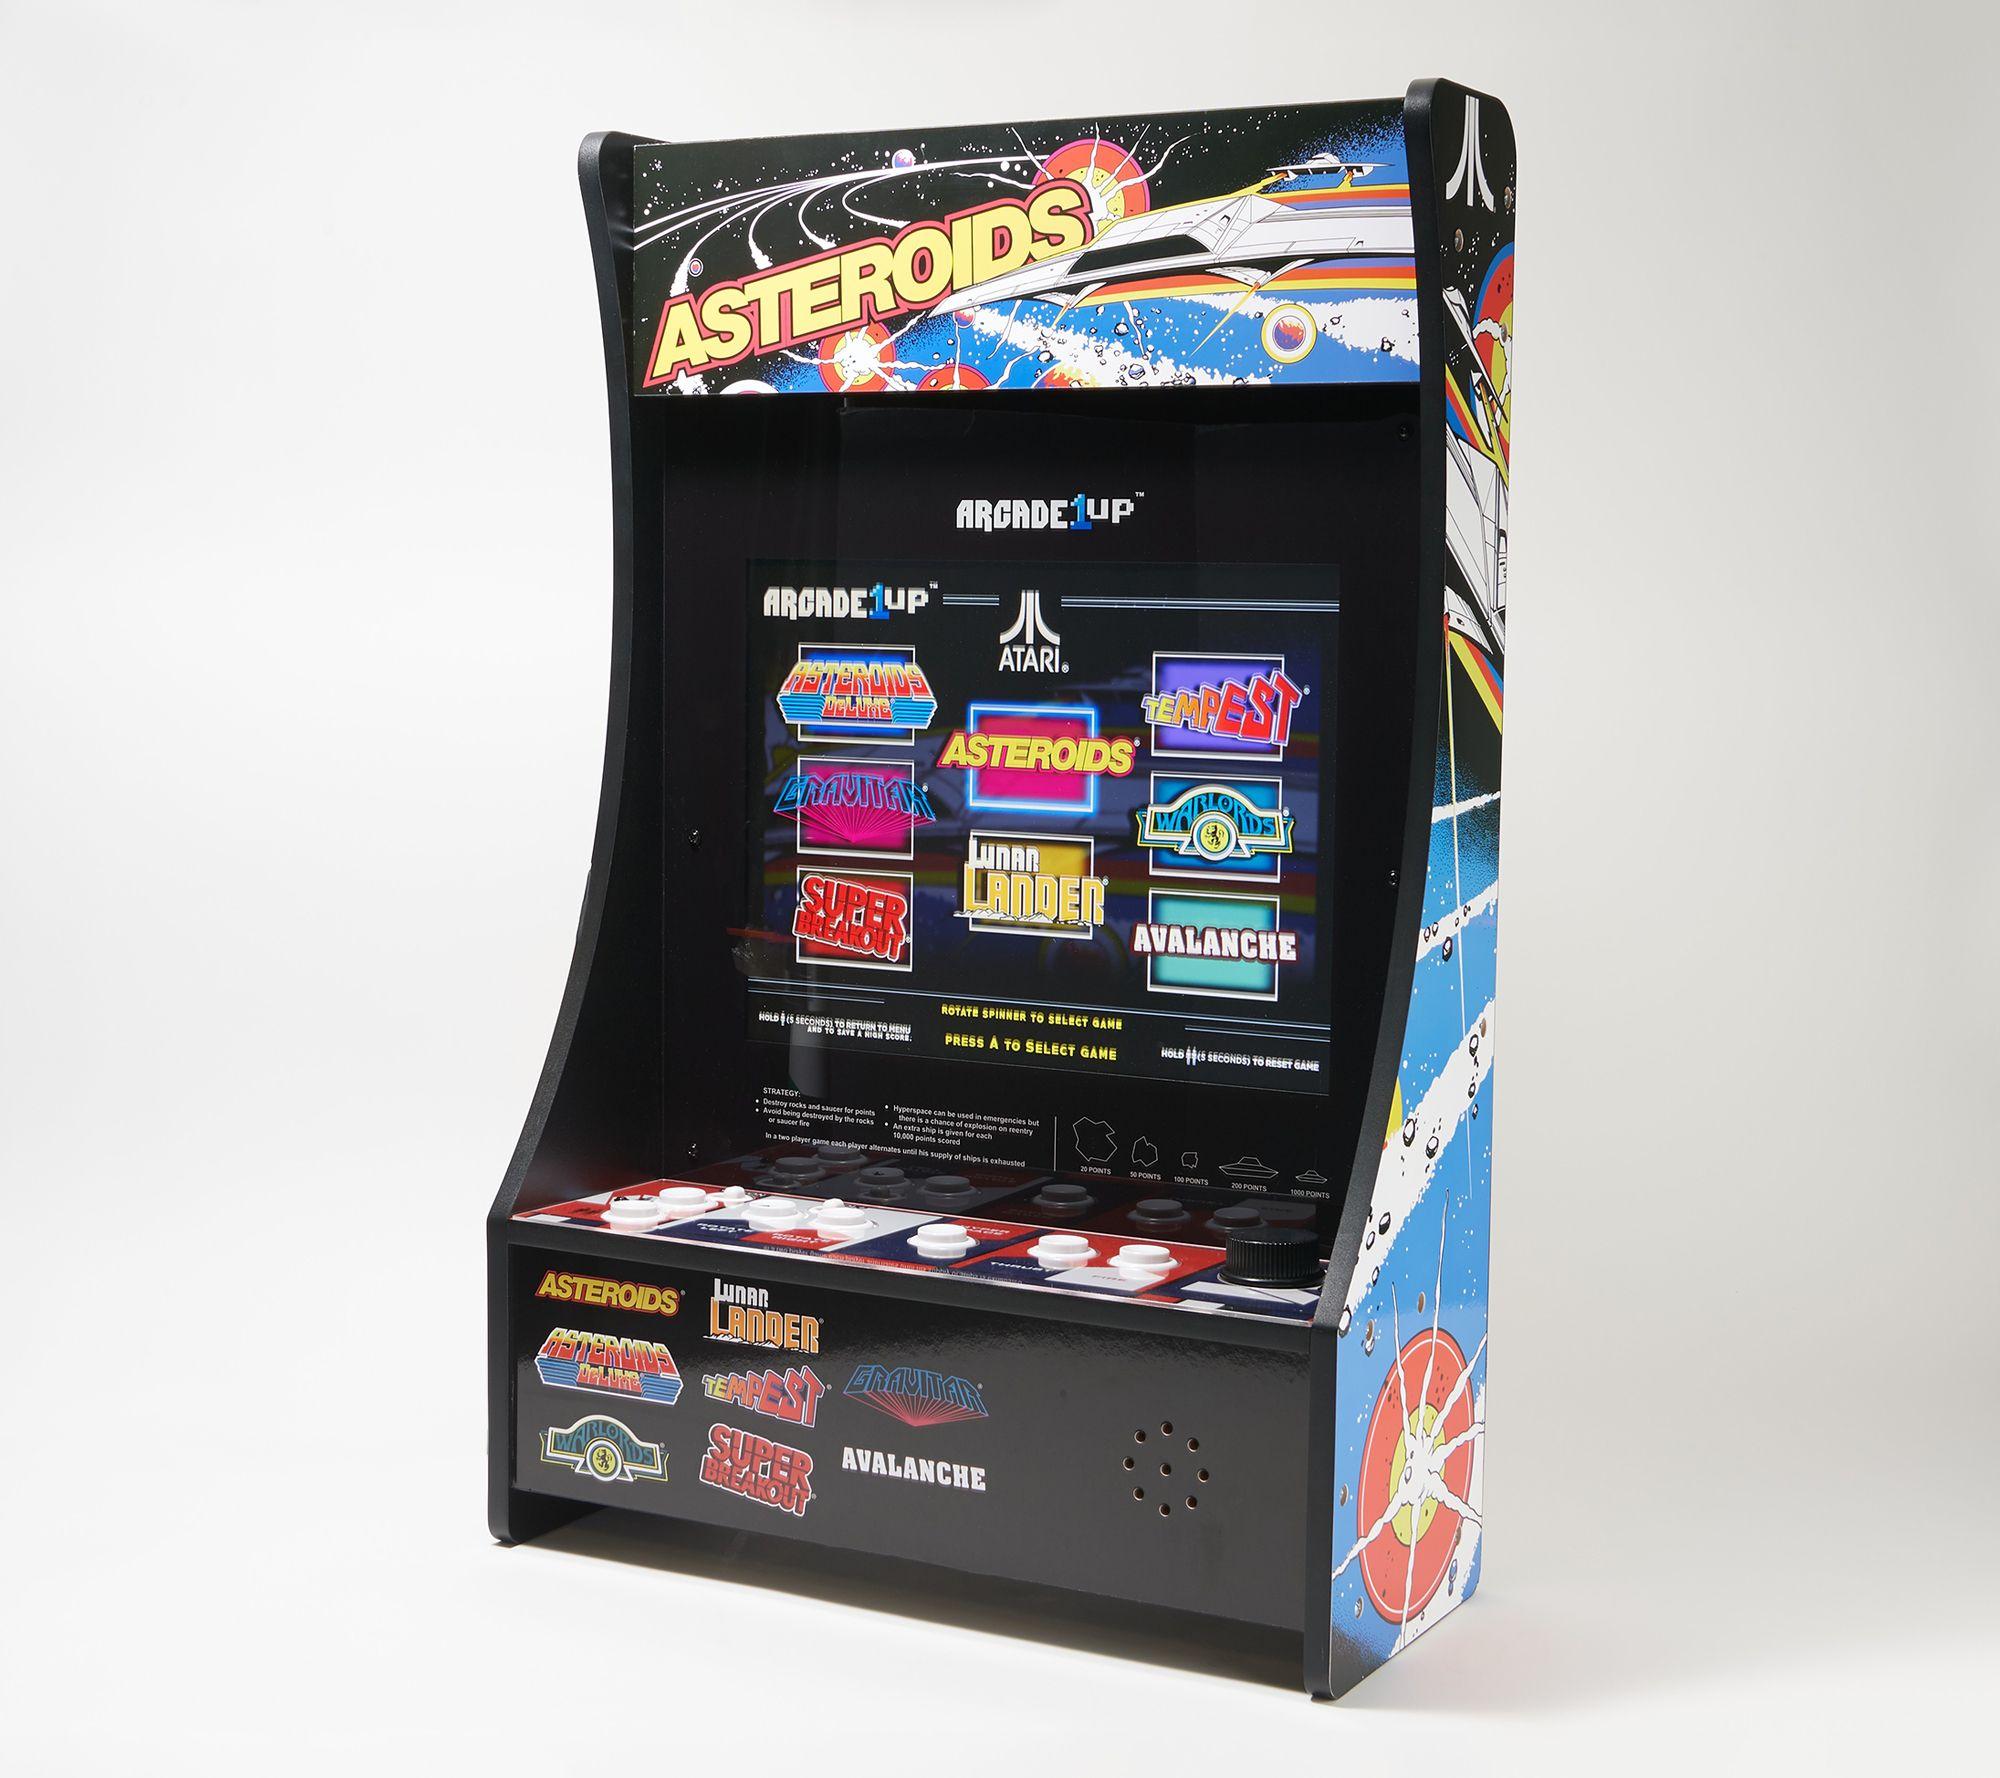 $42 off a portable home arcade machine